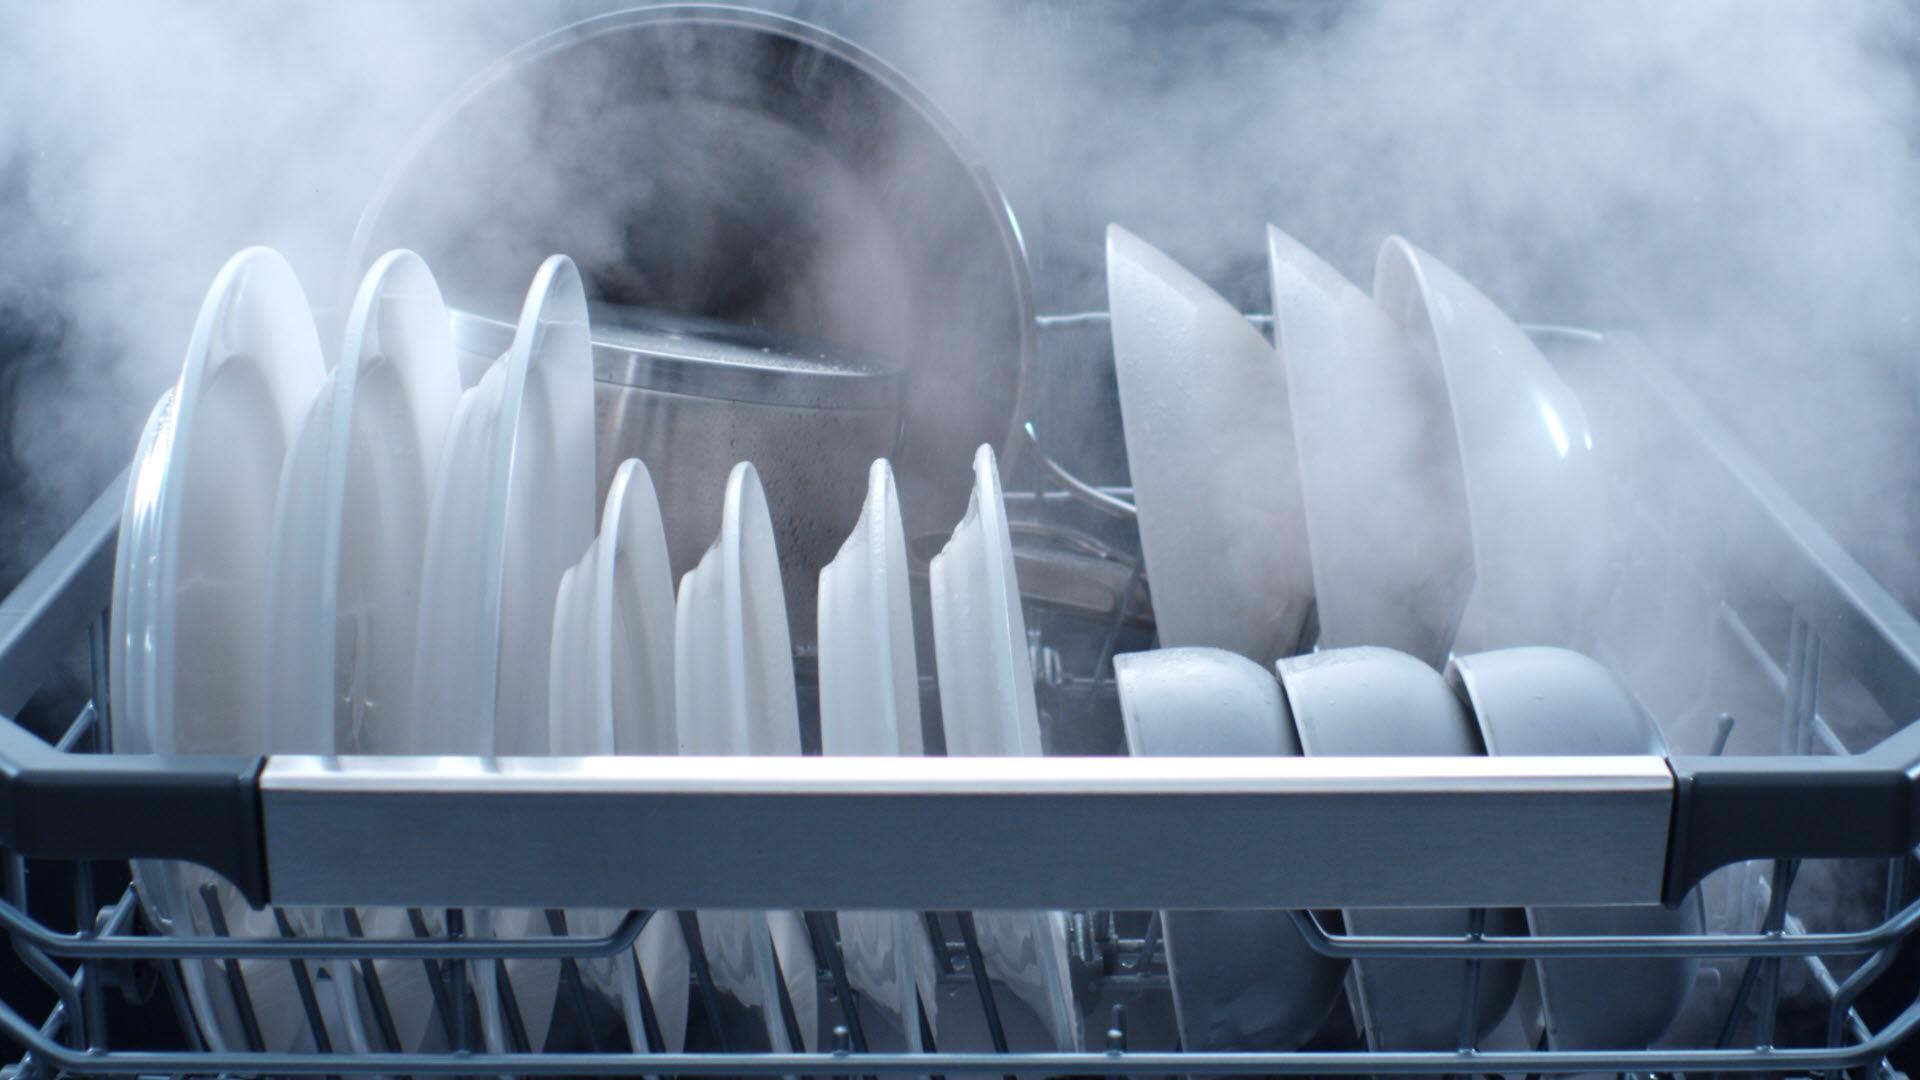 LG전자 디오스 식기세척기의 100도 트루 스팀 기능으로 식기를 살균하는 모습.